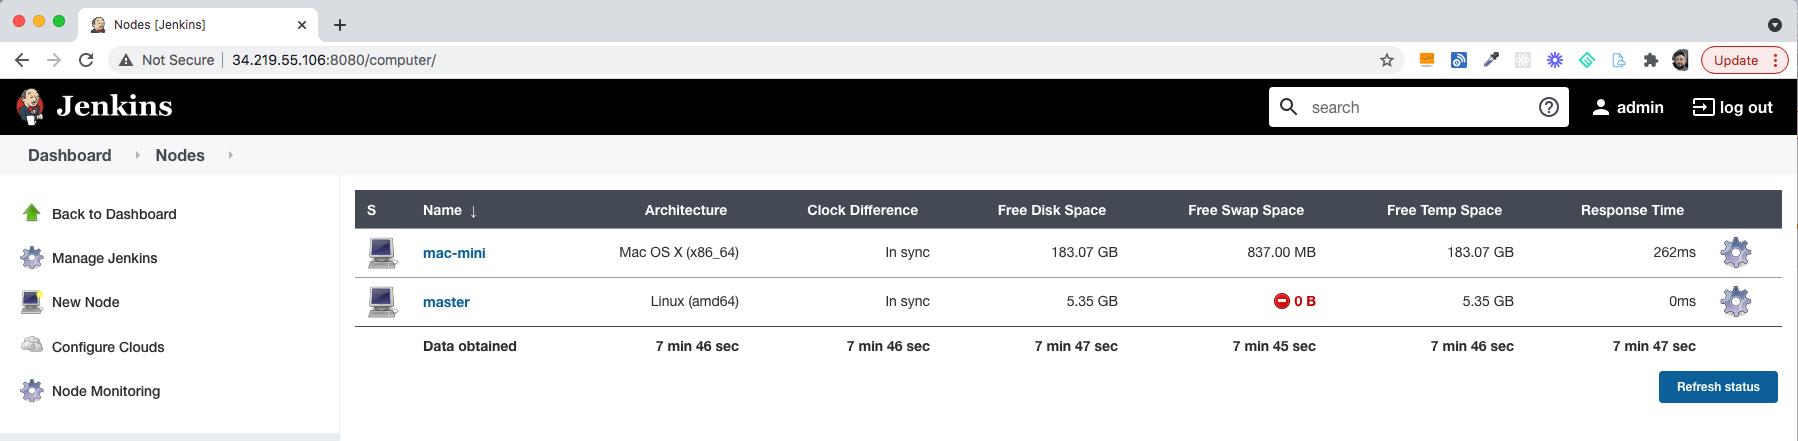 Jenkins screenshot showing hosts